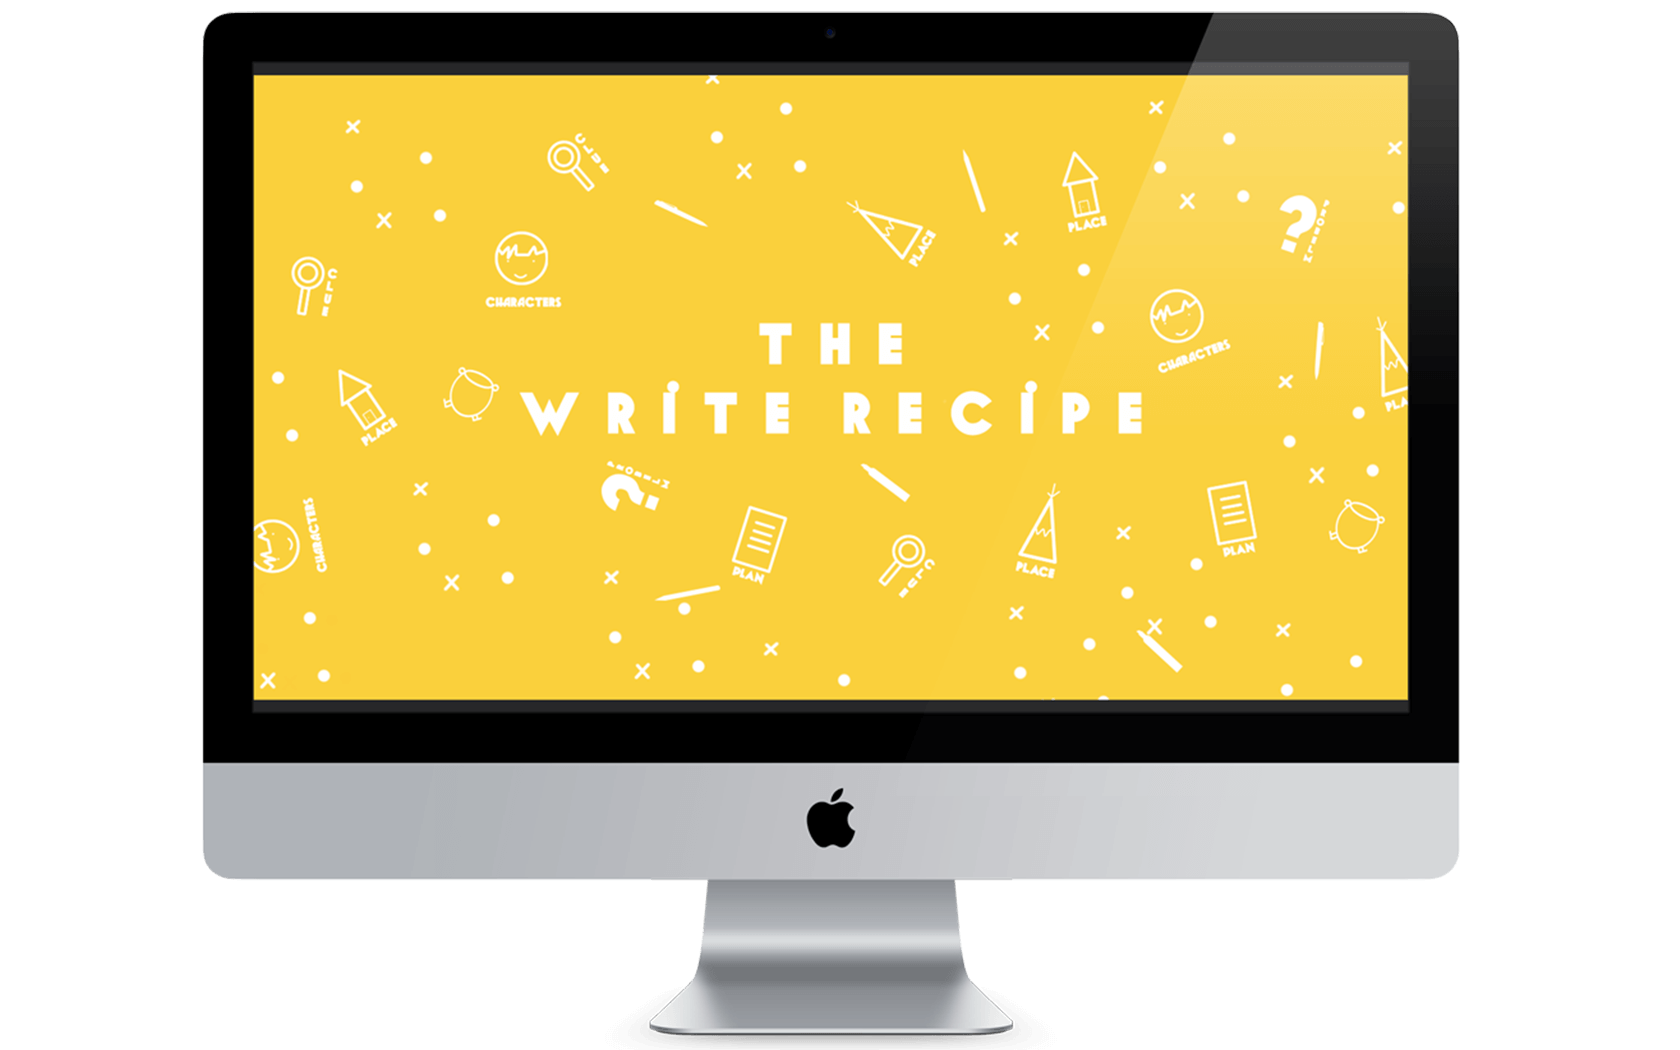 The Write Recipe - Creative Writing Online Course